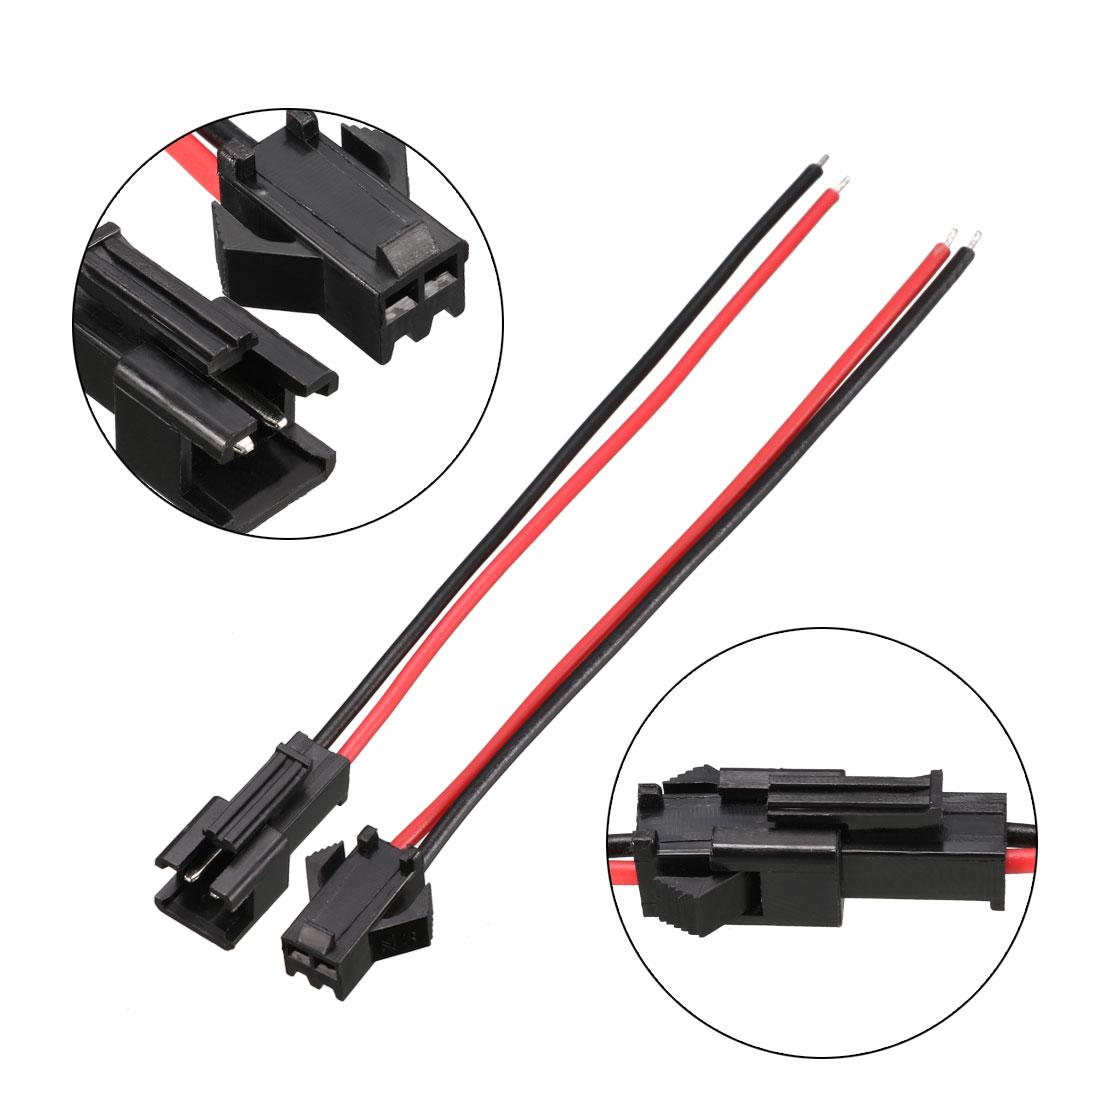 5-Pairs-JST-SM-Connector-2P-EL-Wire-Cable-Cord-Male-11cm-Female-10cm-Length thumbnail 3